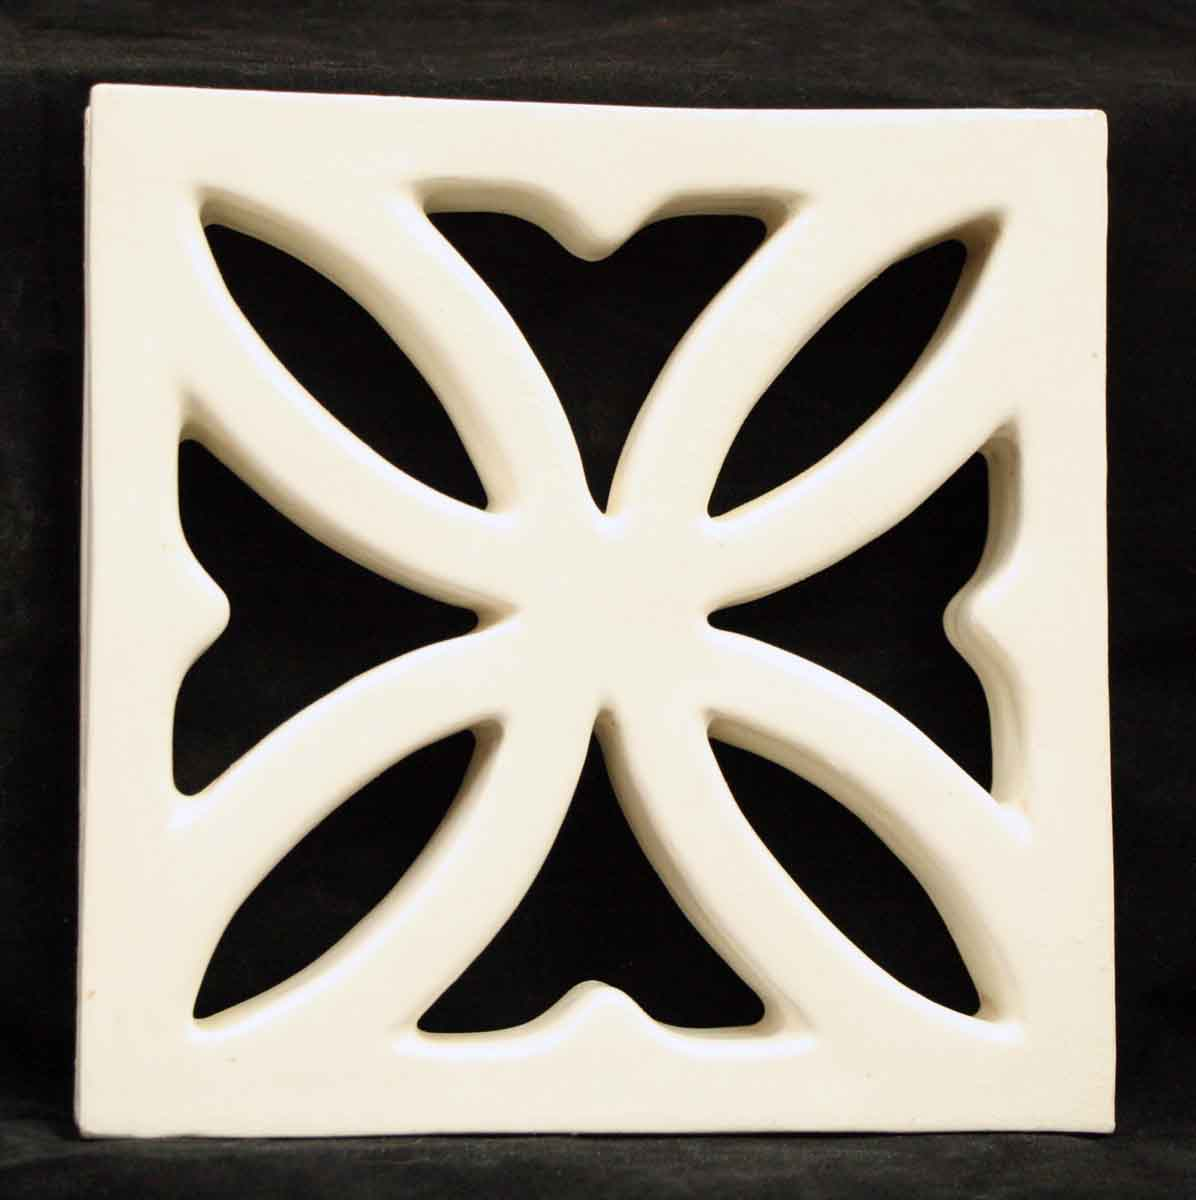 White Cut Out Geometric Tile